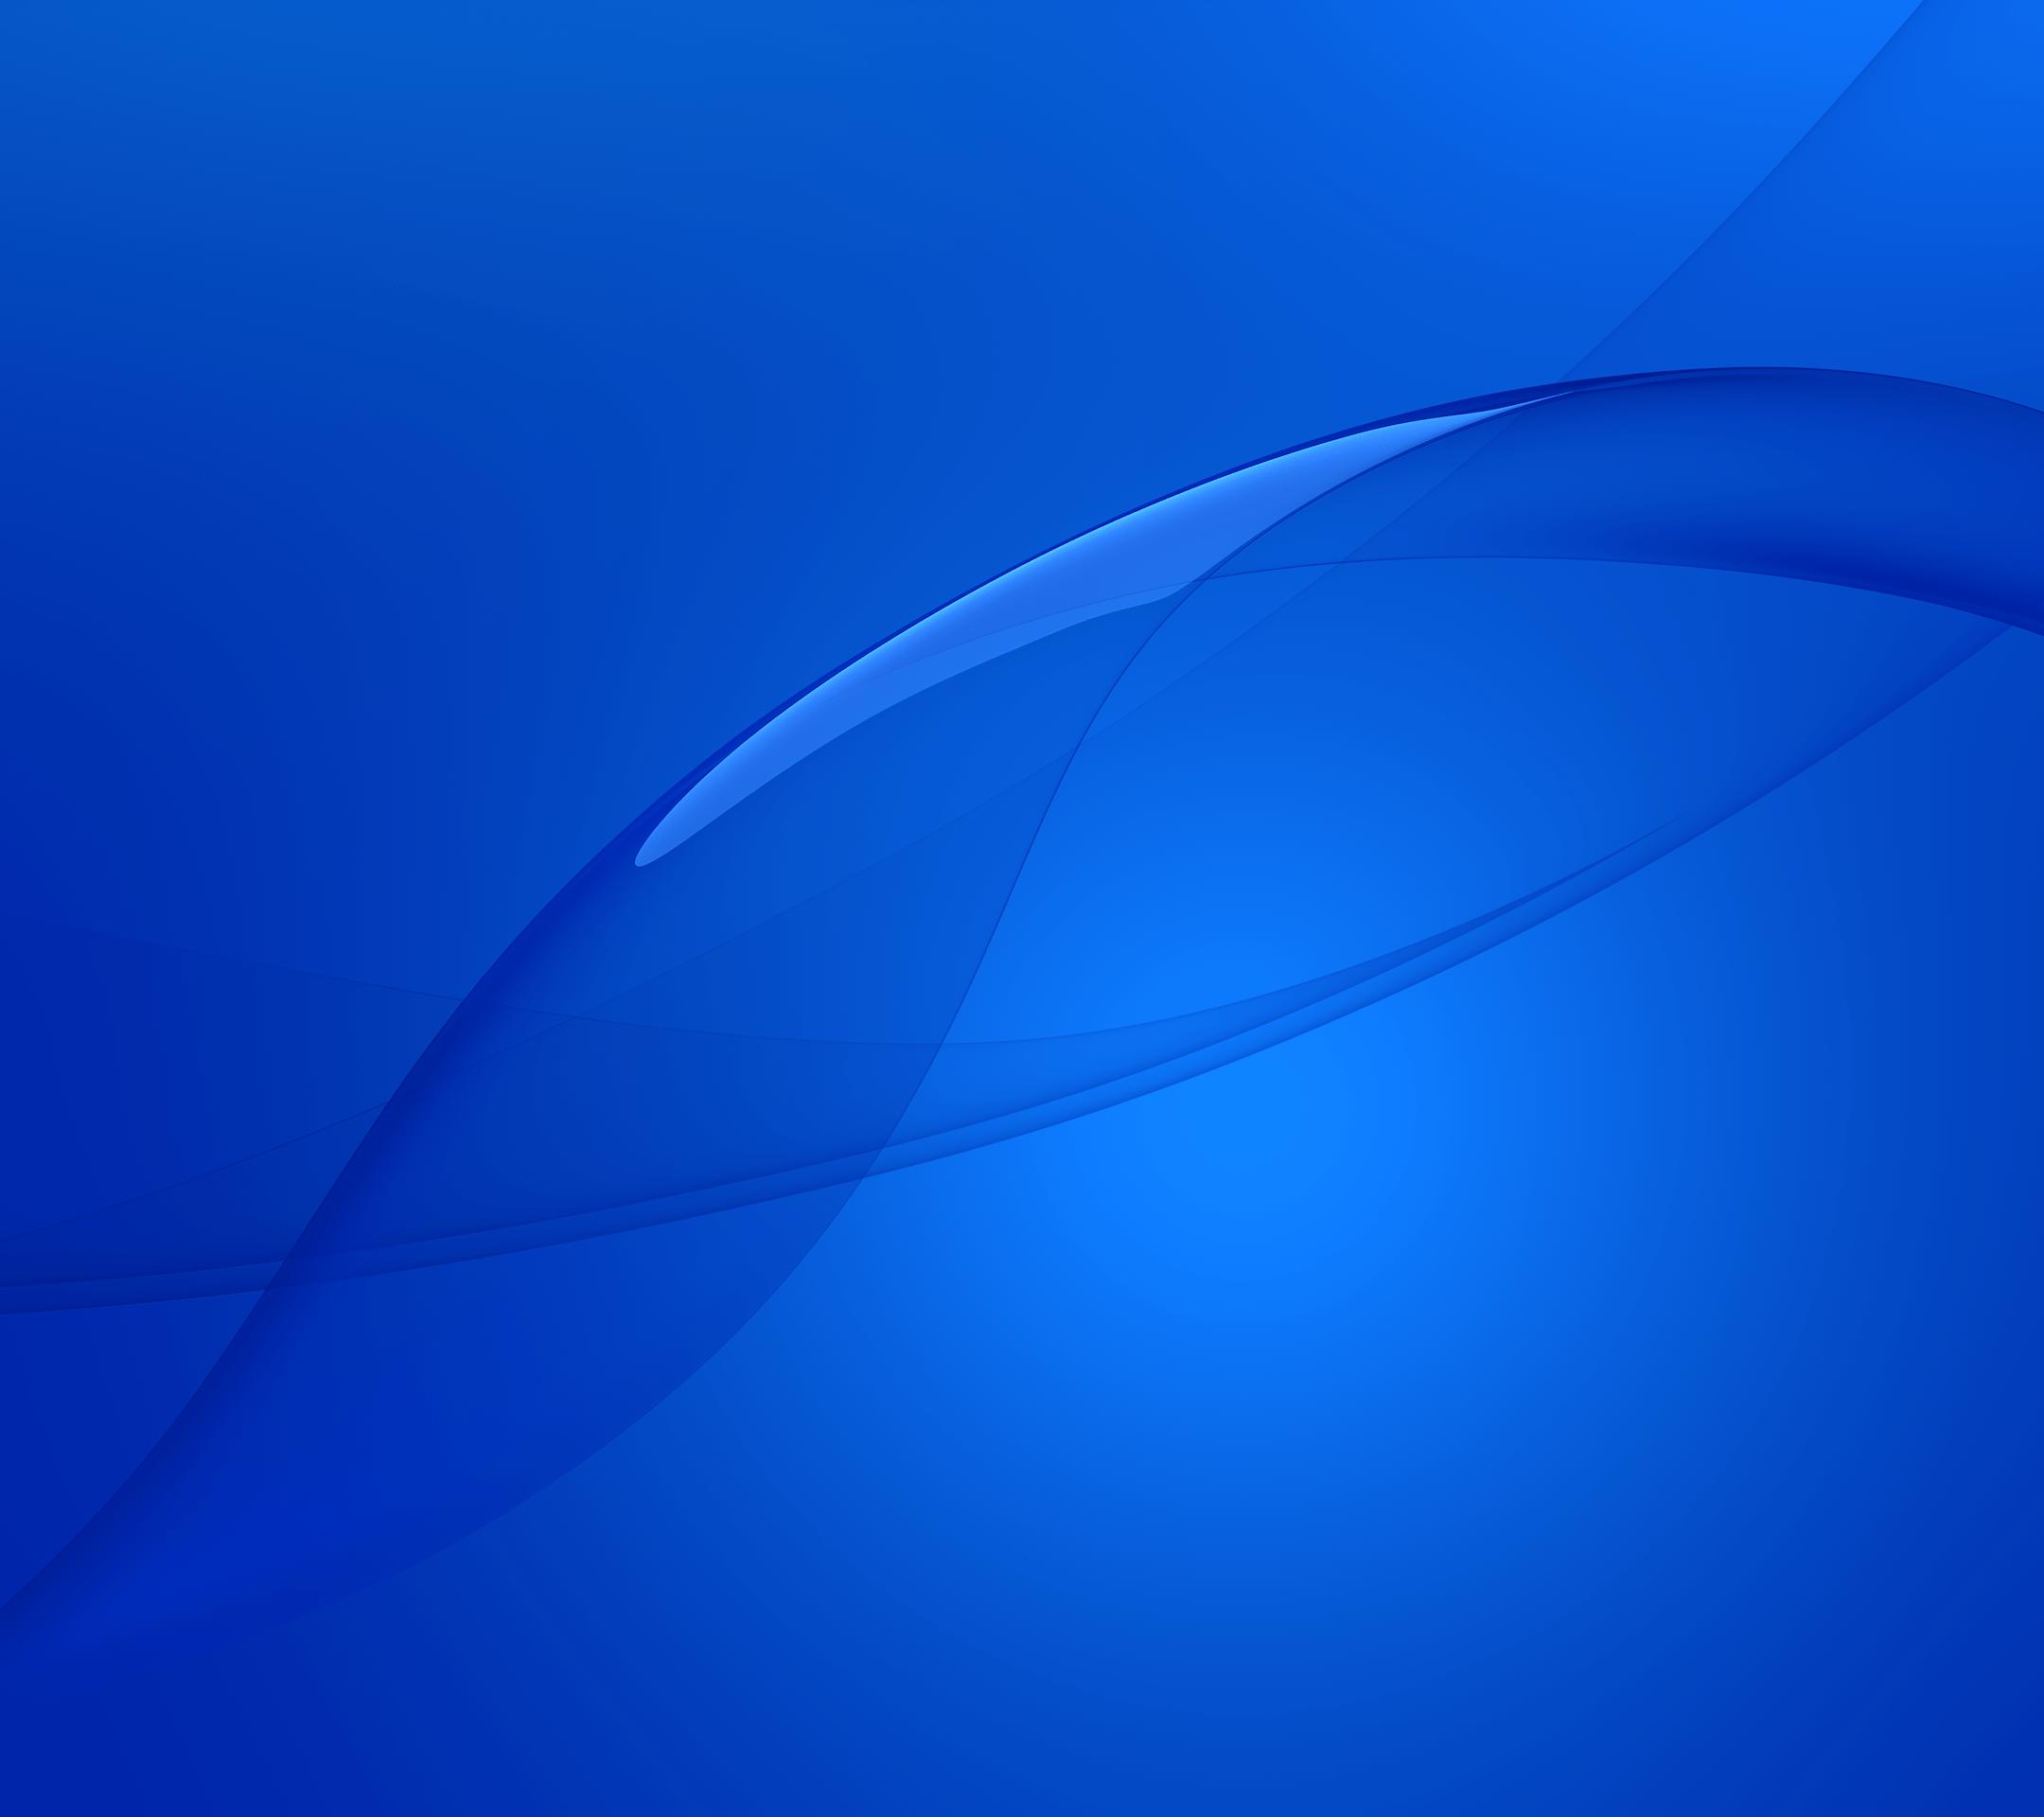 Sony Xperia Xz3 Wallpapers Top Free Sony Xperia Xz3